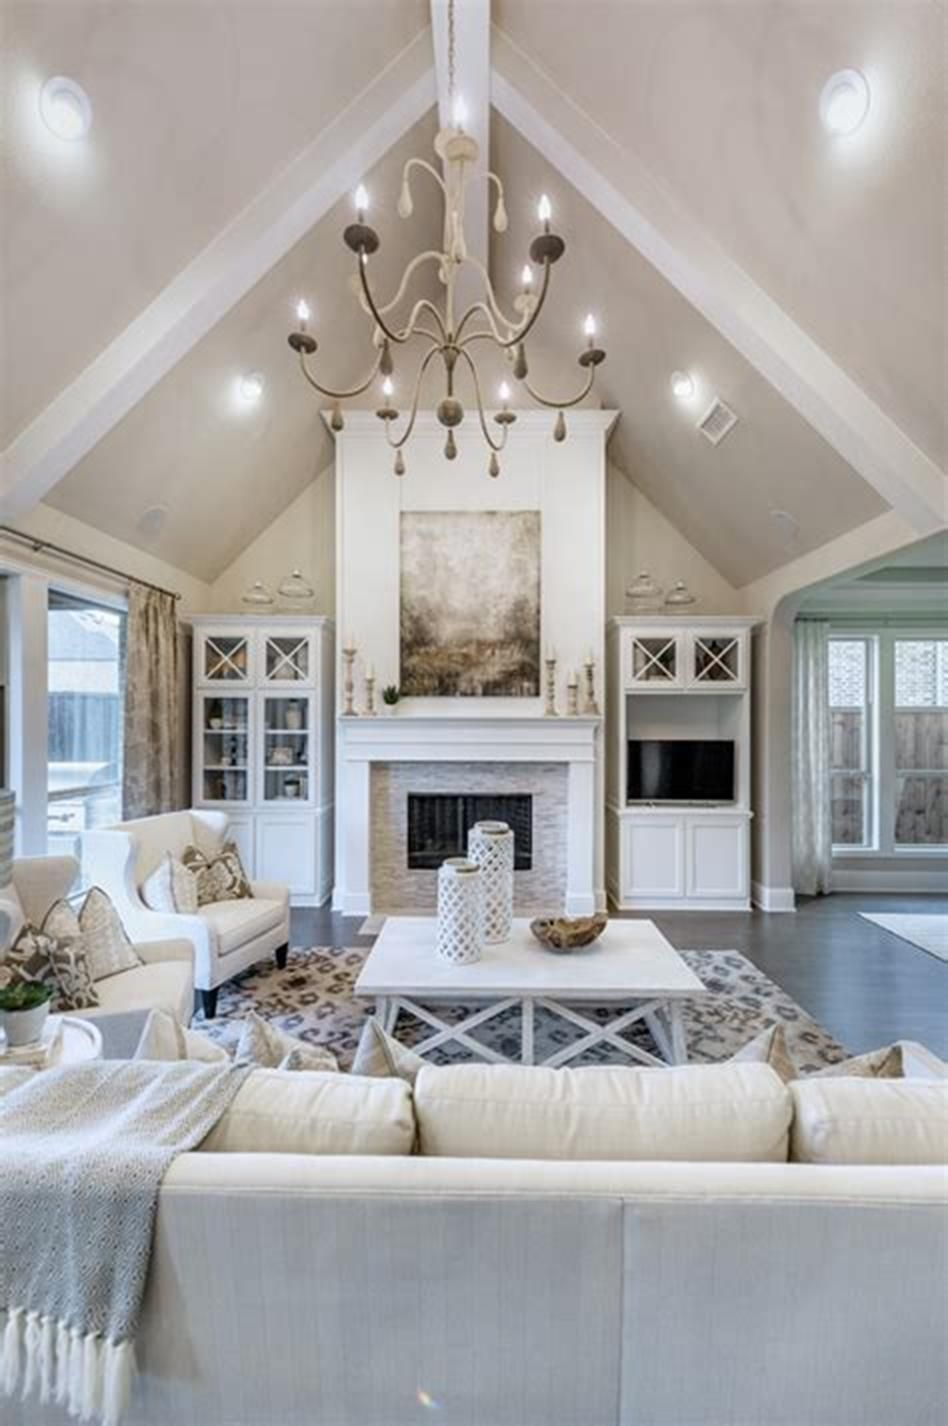 55 Most Popular Transitional Living Room Design Ideas for ...